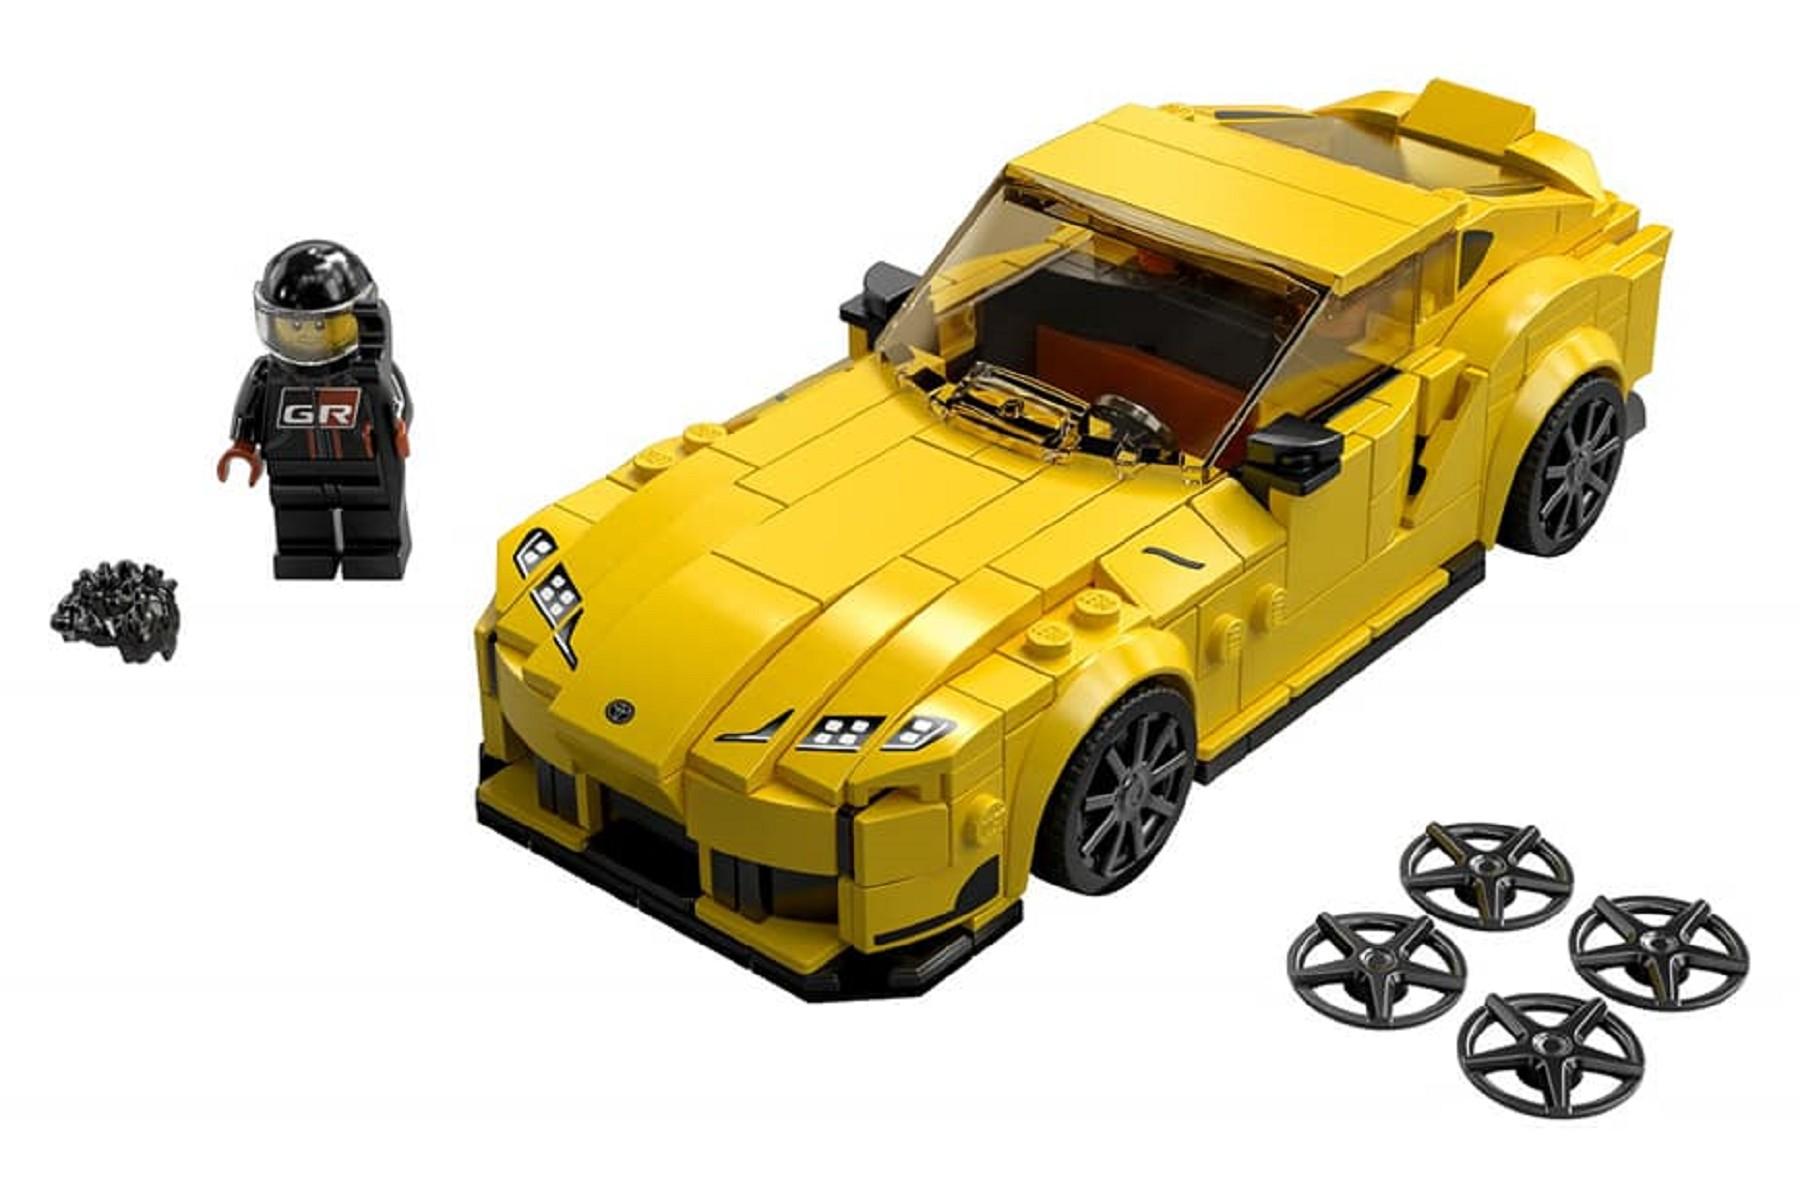 Lego推出「牛魔王」Toyota GR Supra。(圖片來源/ Lego) 這台牛魔王我買得起! Lego極速賽車新品出爐